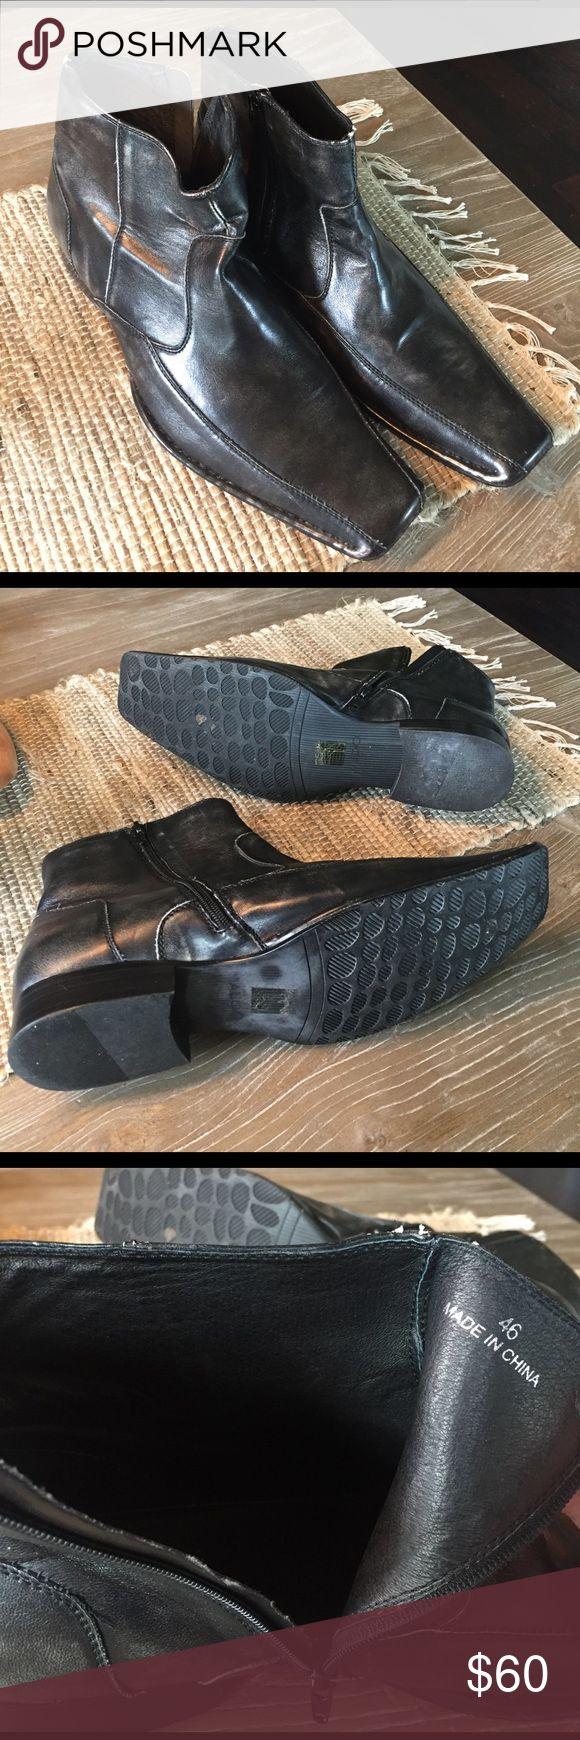 Aldo Leather European Dress Shoes Gently used - Excellent Condition - Size 46M (European) (12-13 US) Aldo Shoes Boots